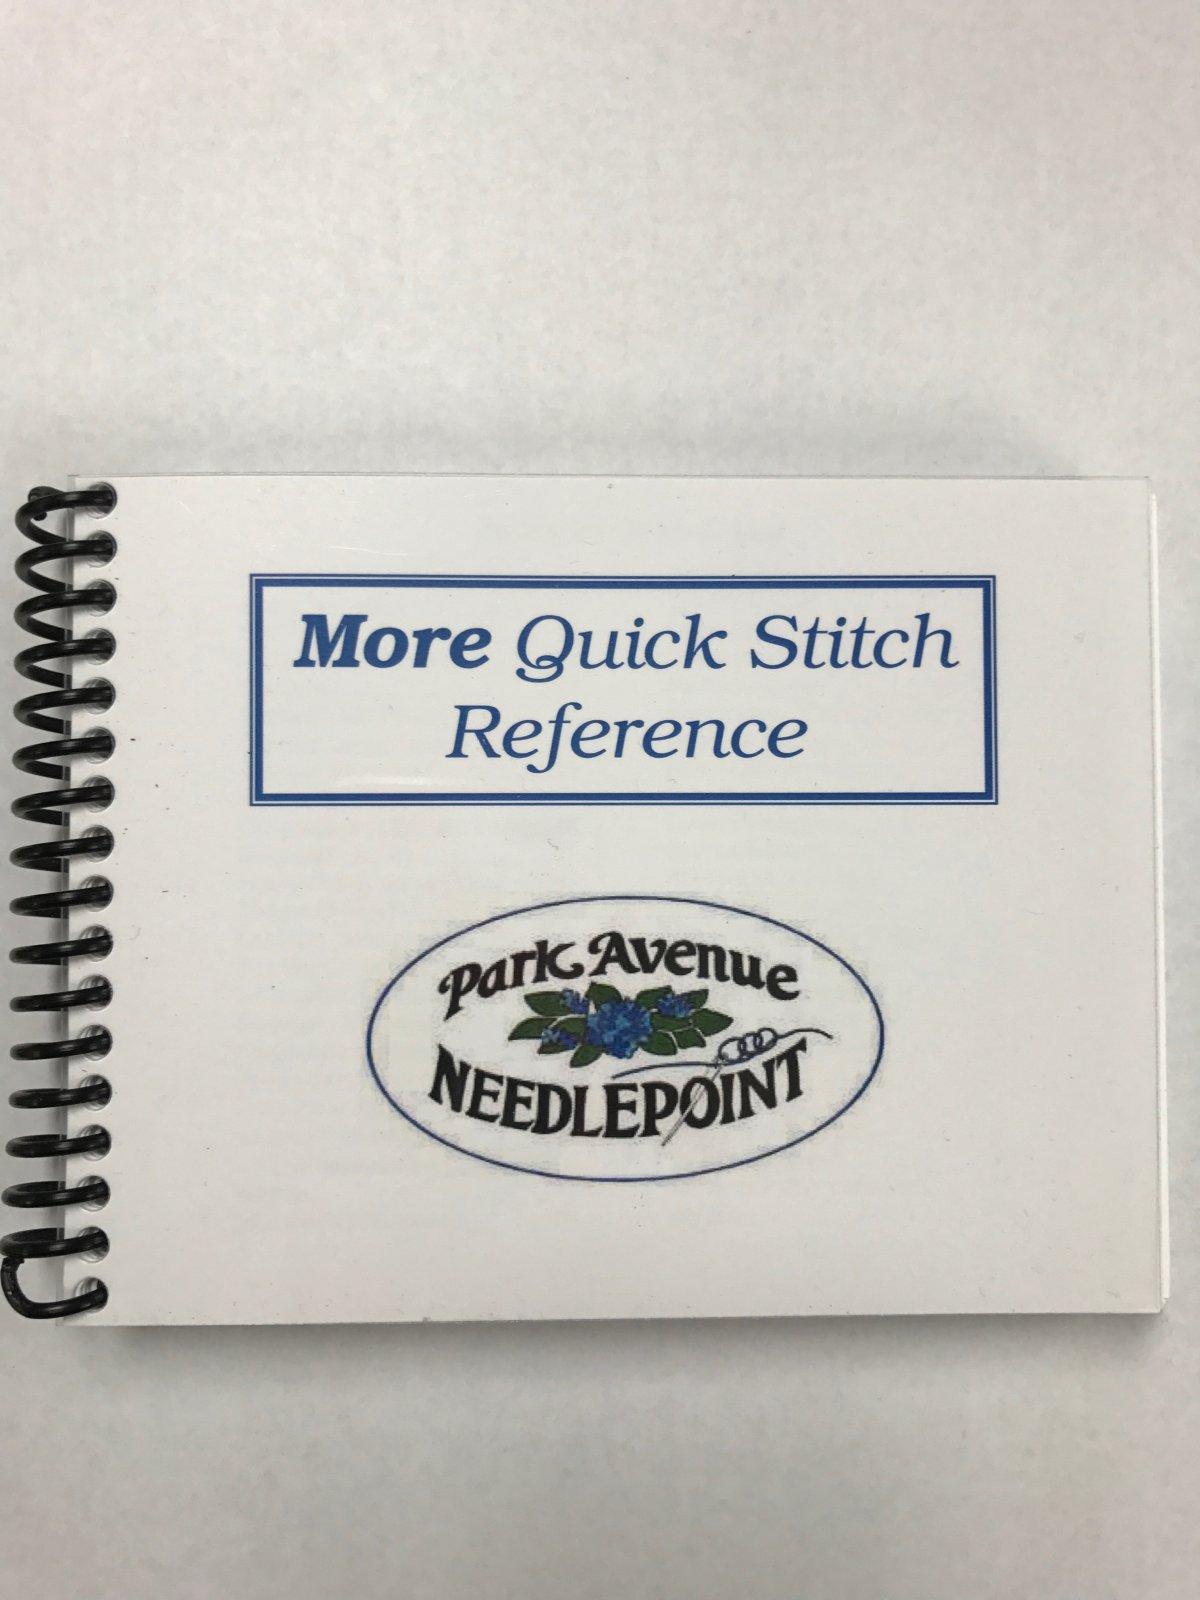 More Quick Stitch